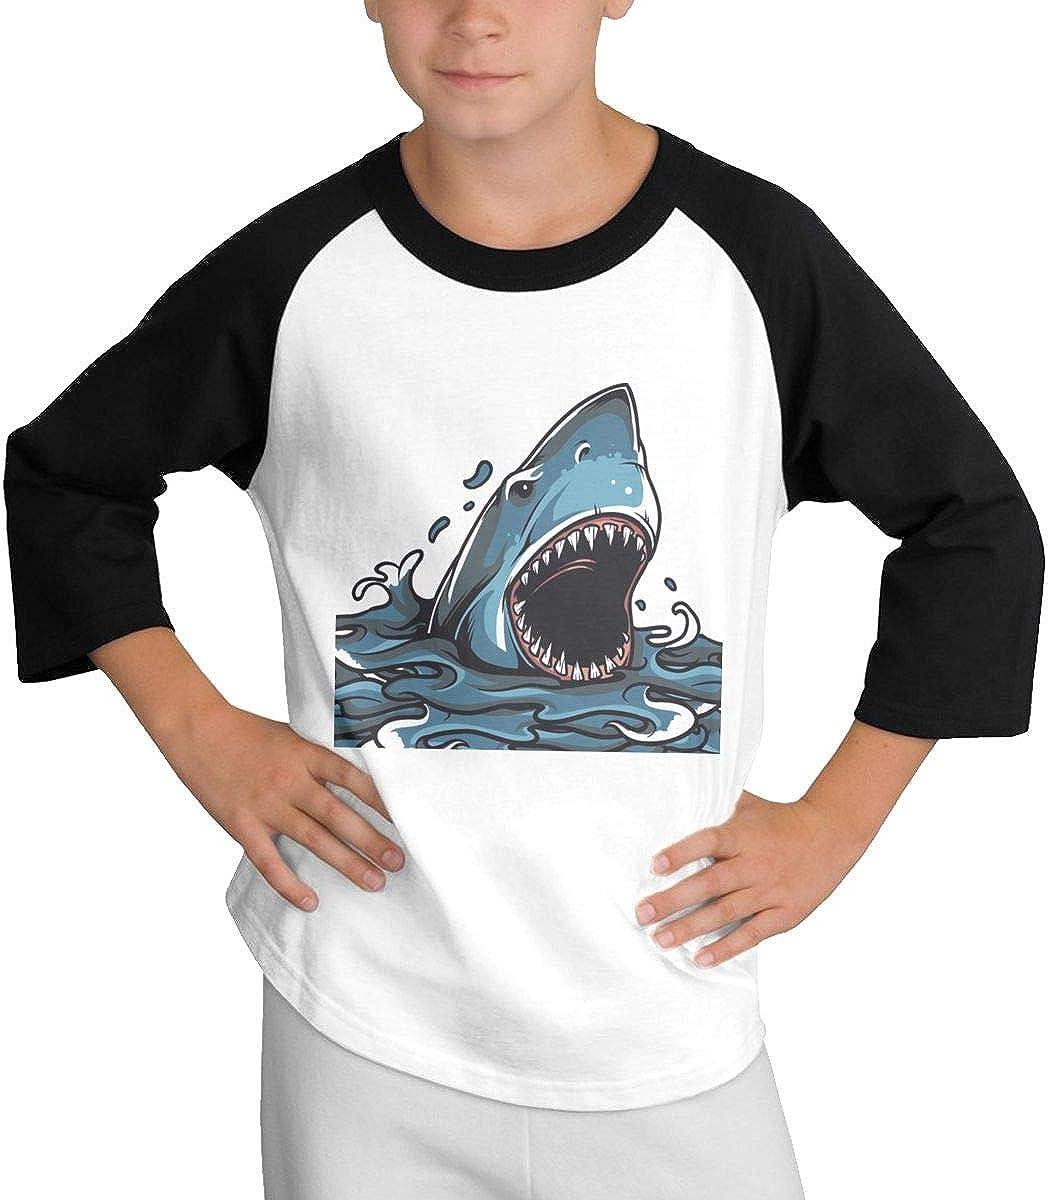 Angry Shark 7 Raglan 3//4 Short-Sleeve T-Shirts Youth Girls Boys